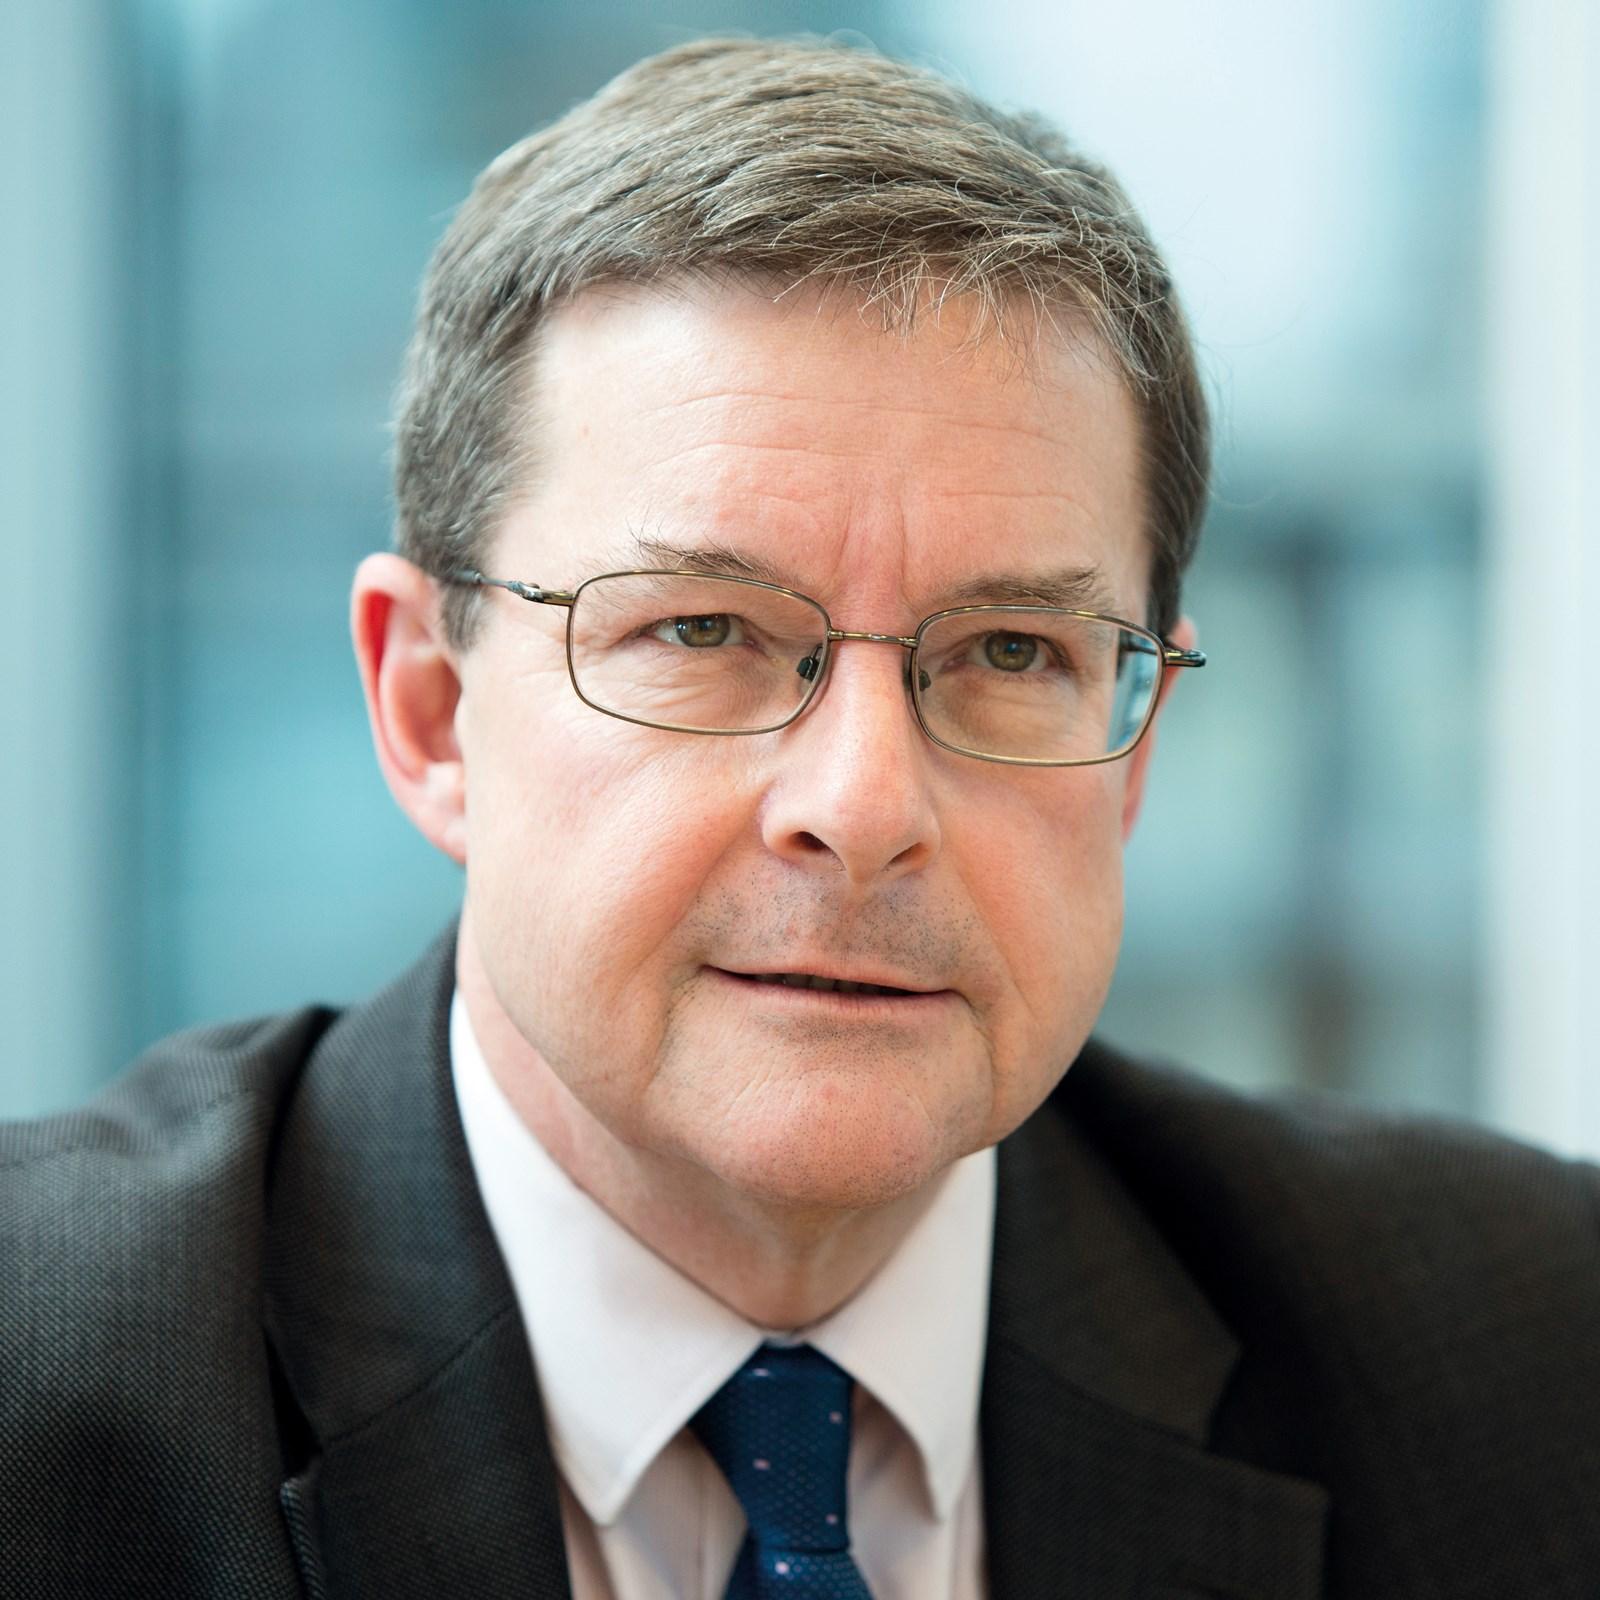 Chair, John Godfrey - Corporate Affairs Director, Legal & General